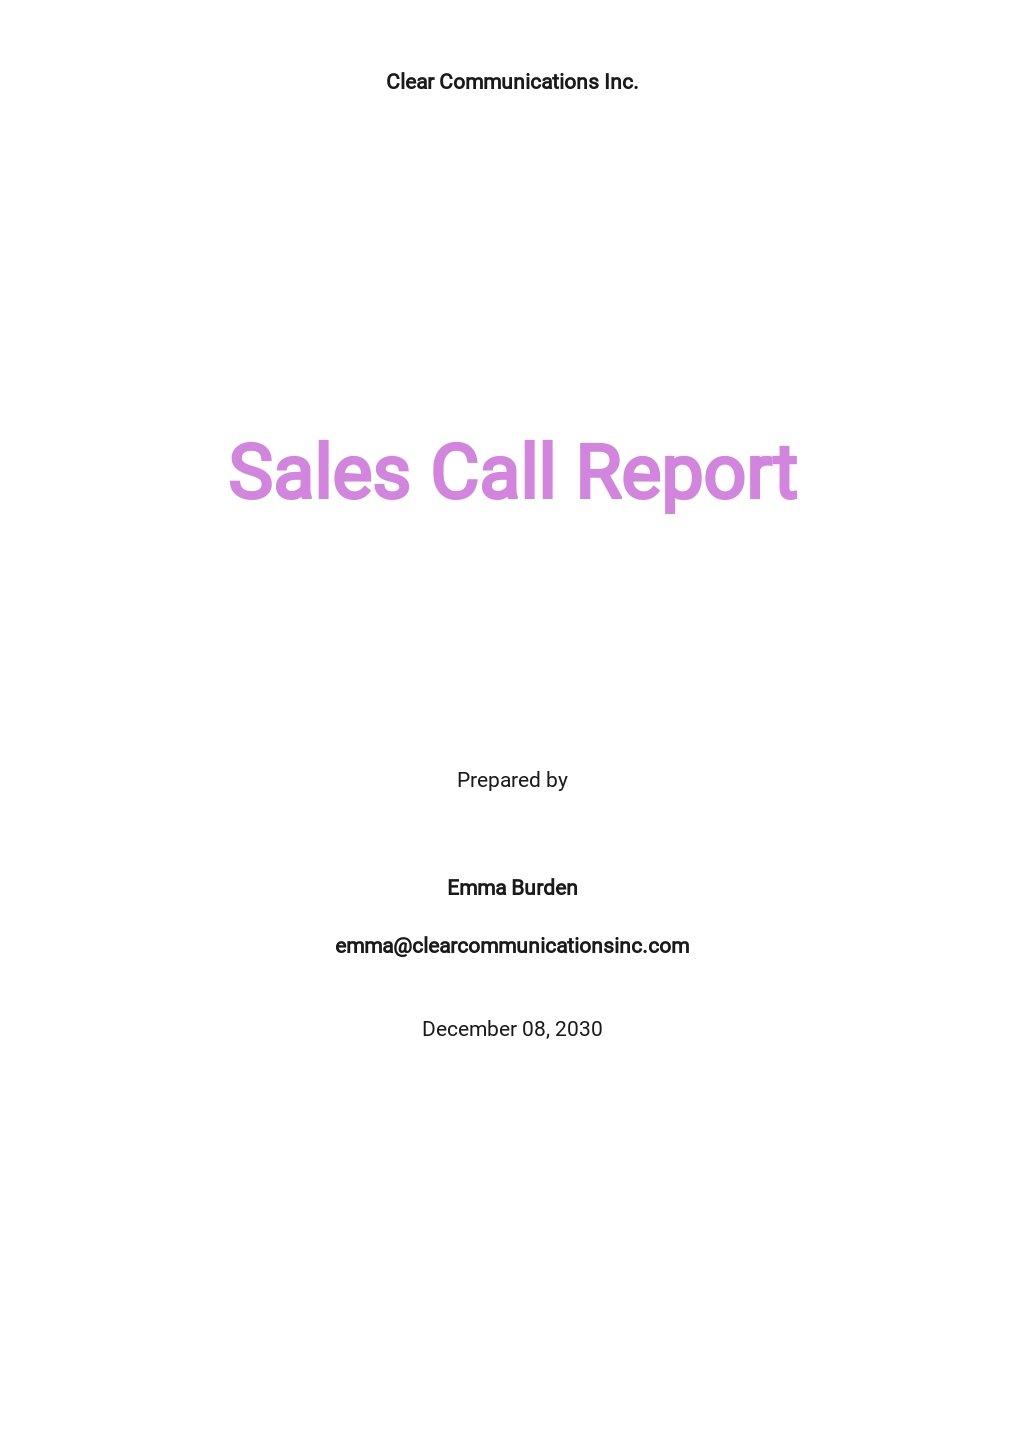 Sales Call Report Template.jpe